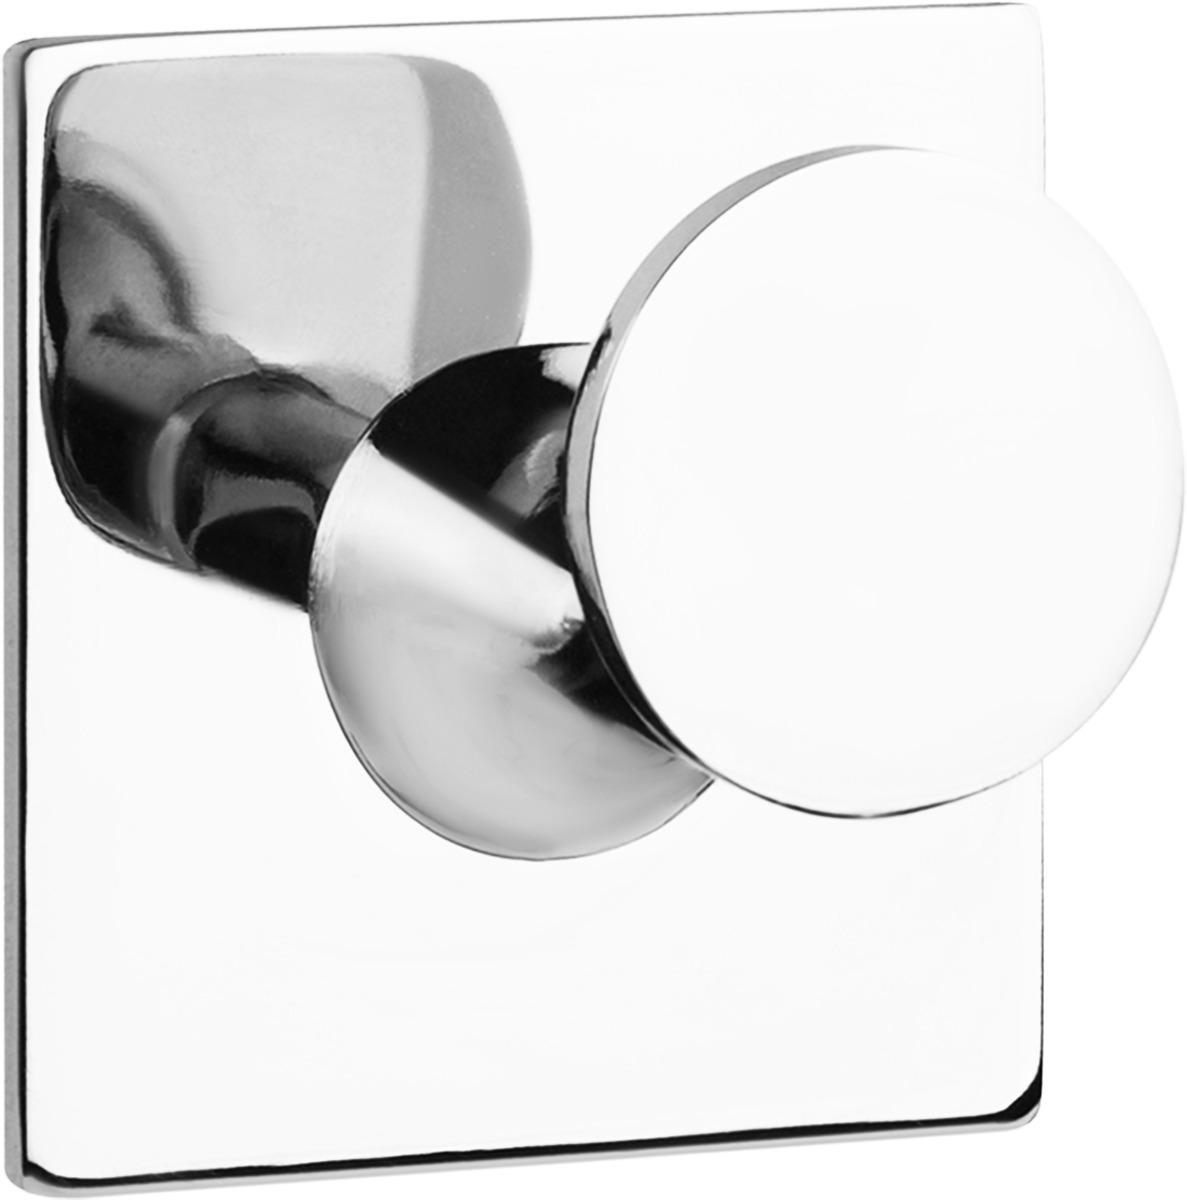 цена на Крючок для ванной Kleber Expert KLE-EX028, серебристый